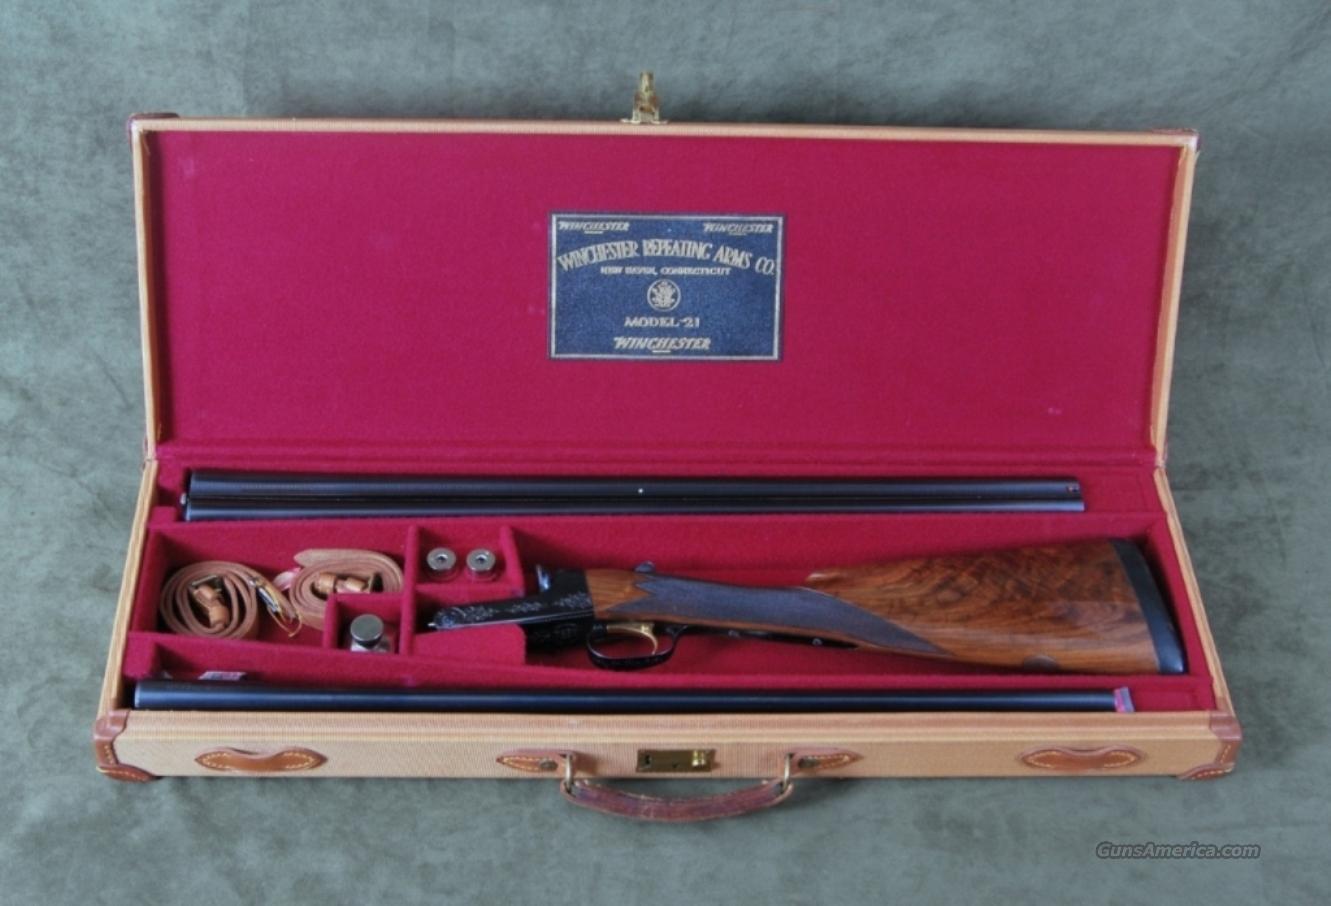 Winchester Model 21 16ga. CUSTOM GRADE, 2 BARREL SET, CODY LETTER  Guns > Shotguns > Winchester Shotguns - Modern > SxS